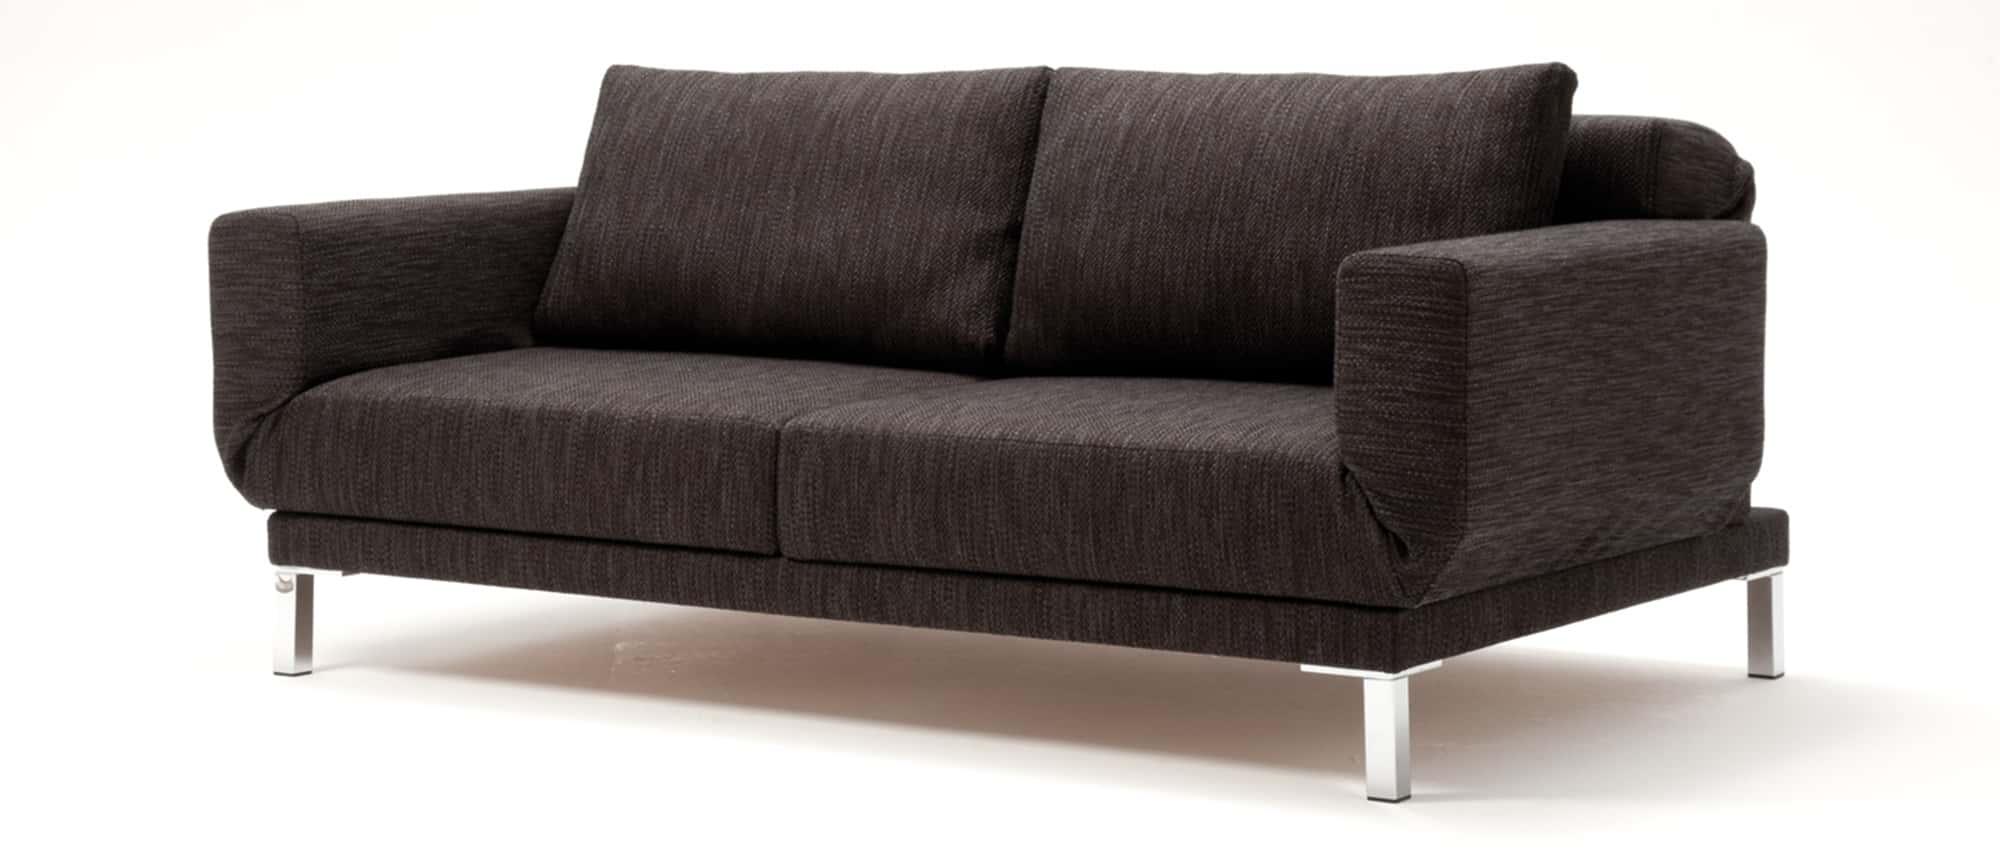 RIGA XL, RIGA Schlafsofa von Franz Fertig. Multifunktionales sofa. Sofa mit Bettfunktion. Relaxposition, Loungeposition und Schlafposition.